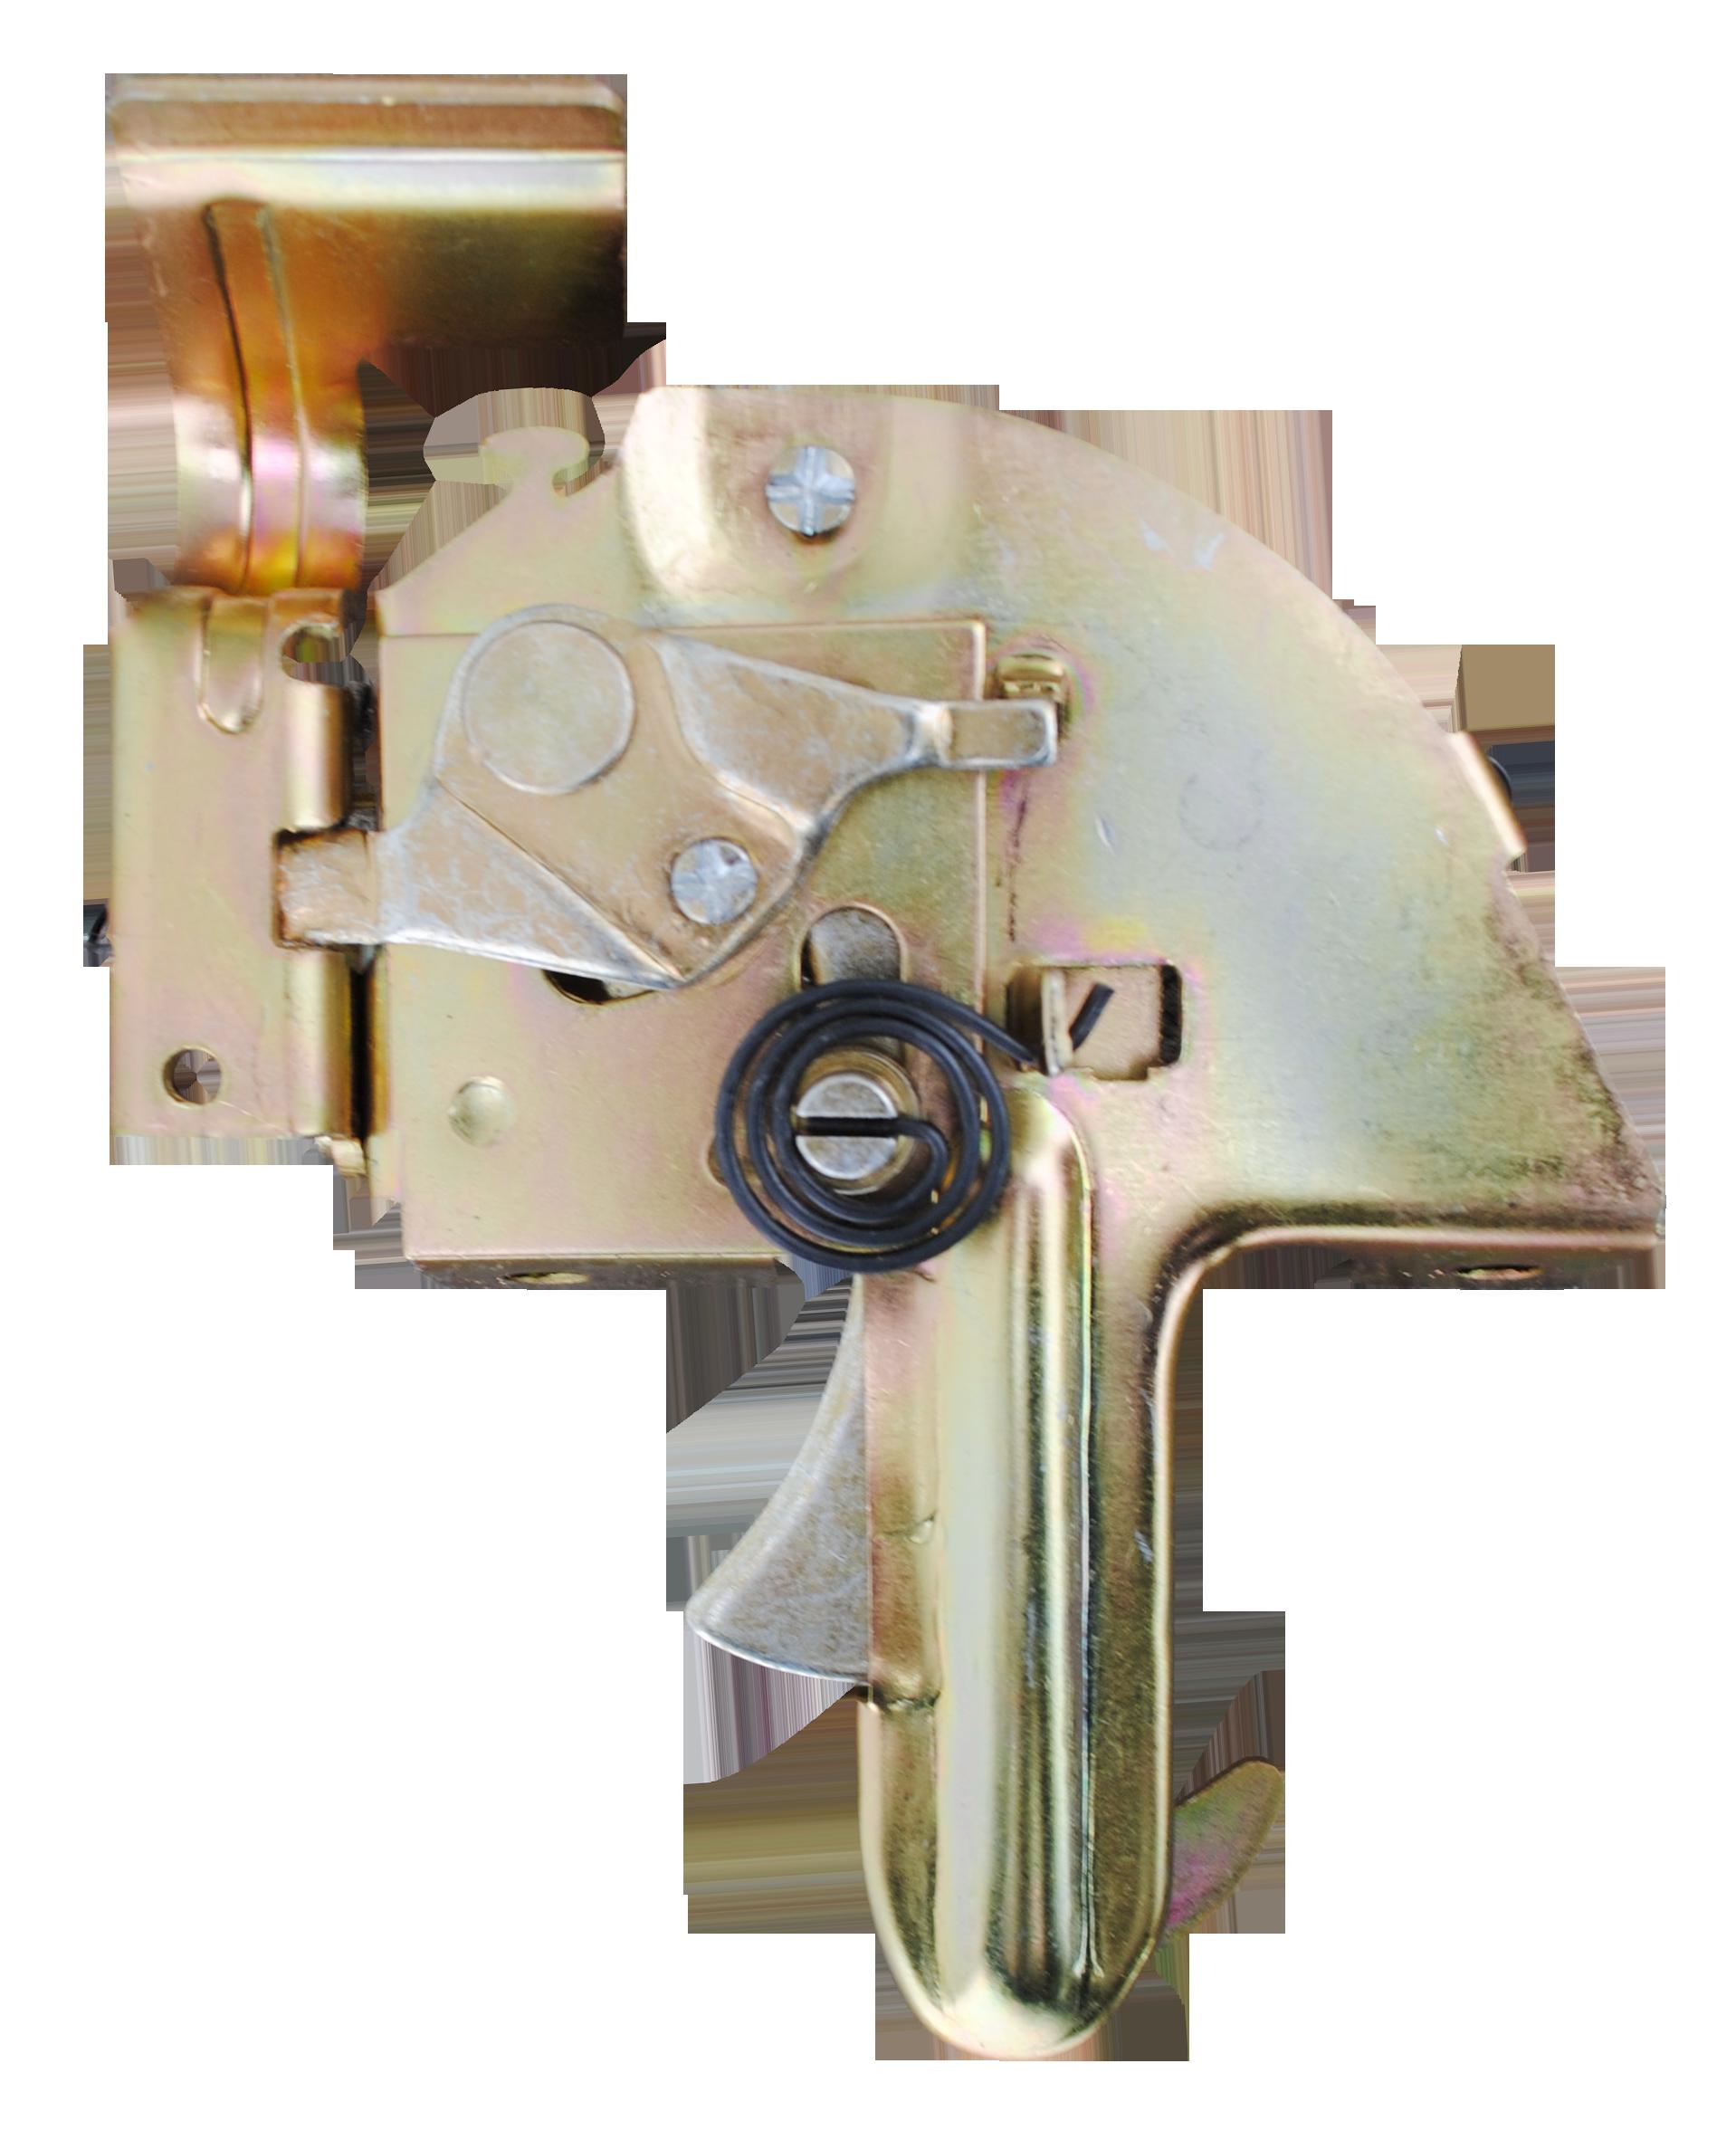 1955-57 C10 hood latch assembly